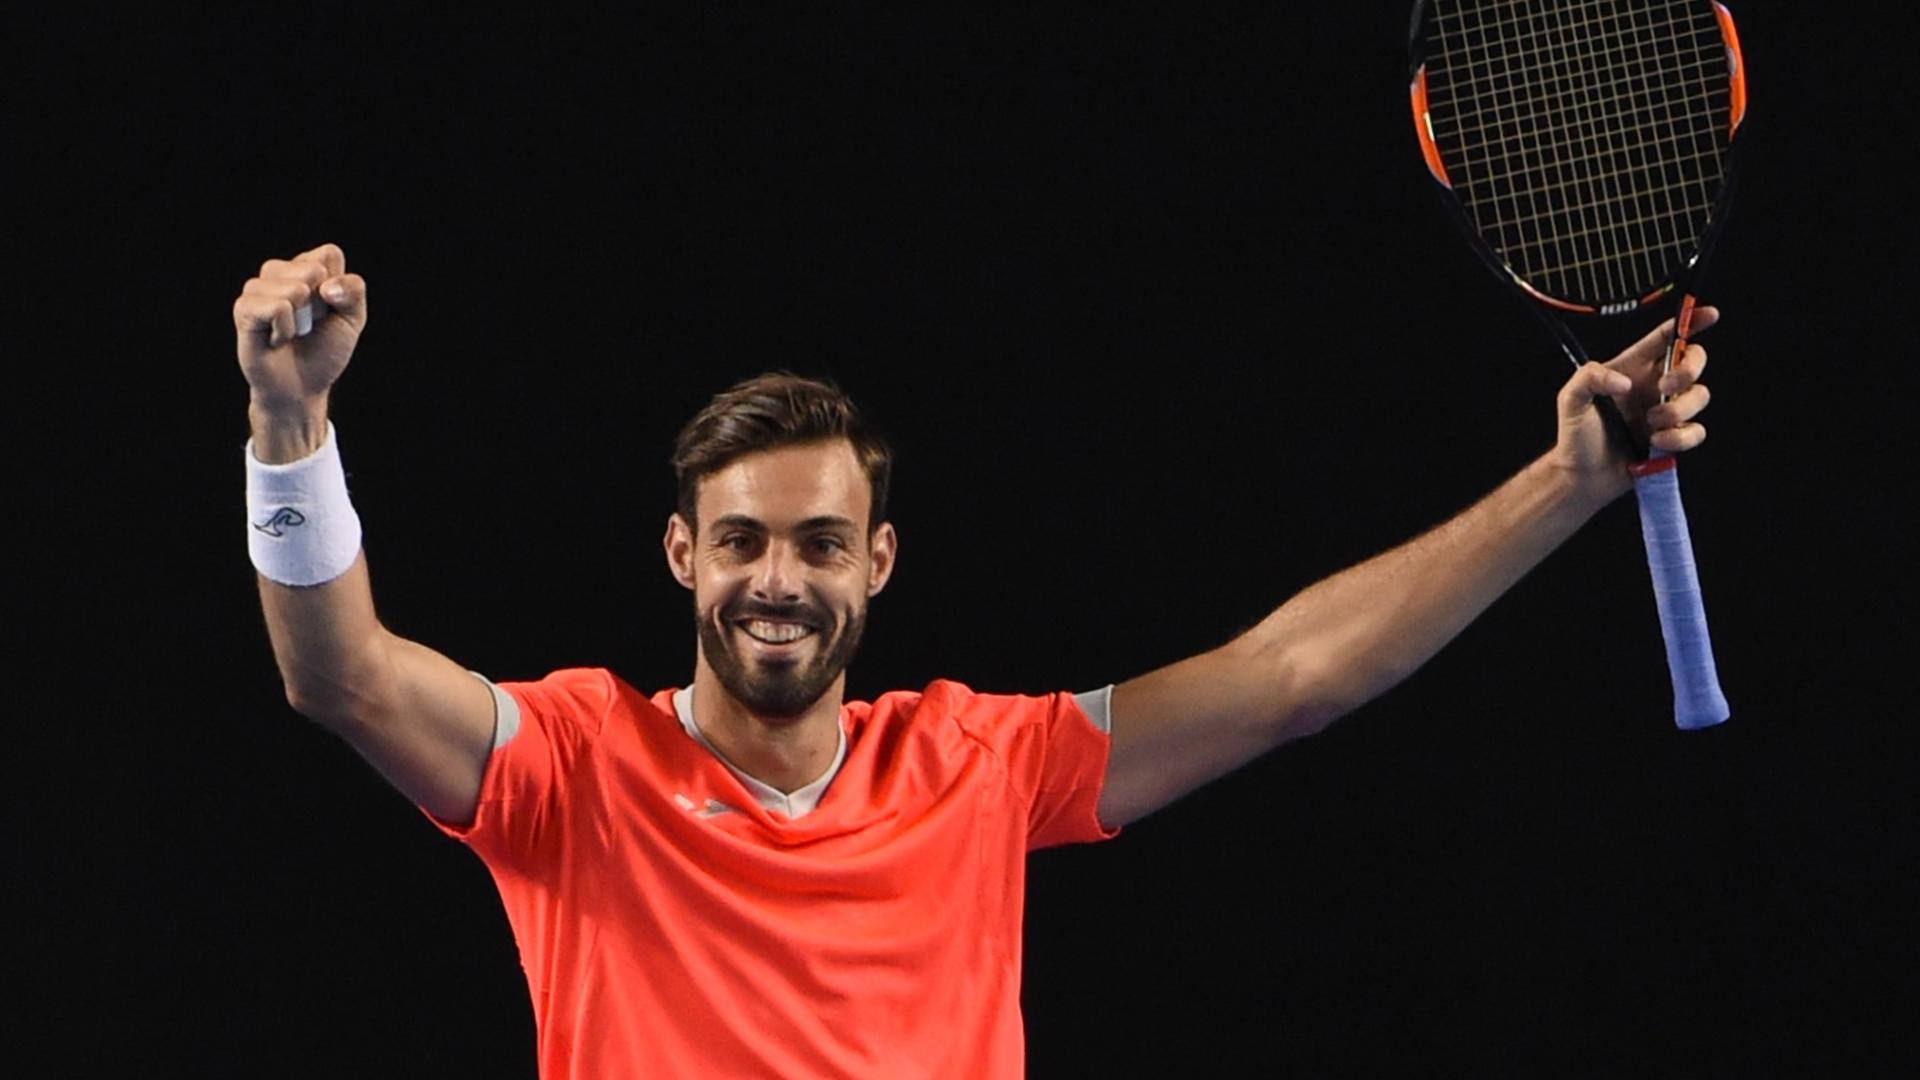 TennisEarth.com - US Open 2013: Marcel Granollers vs. Tim Smyczek ...